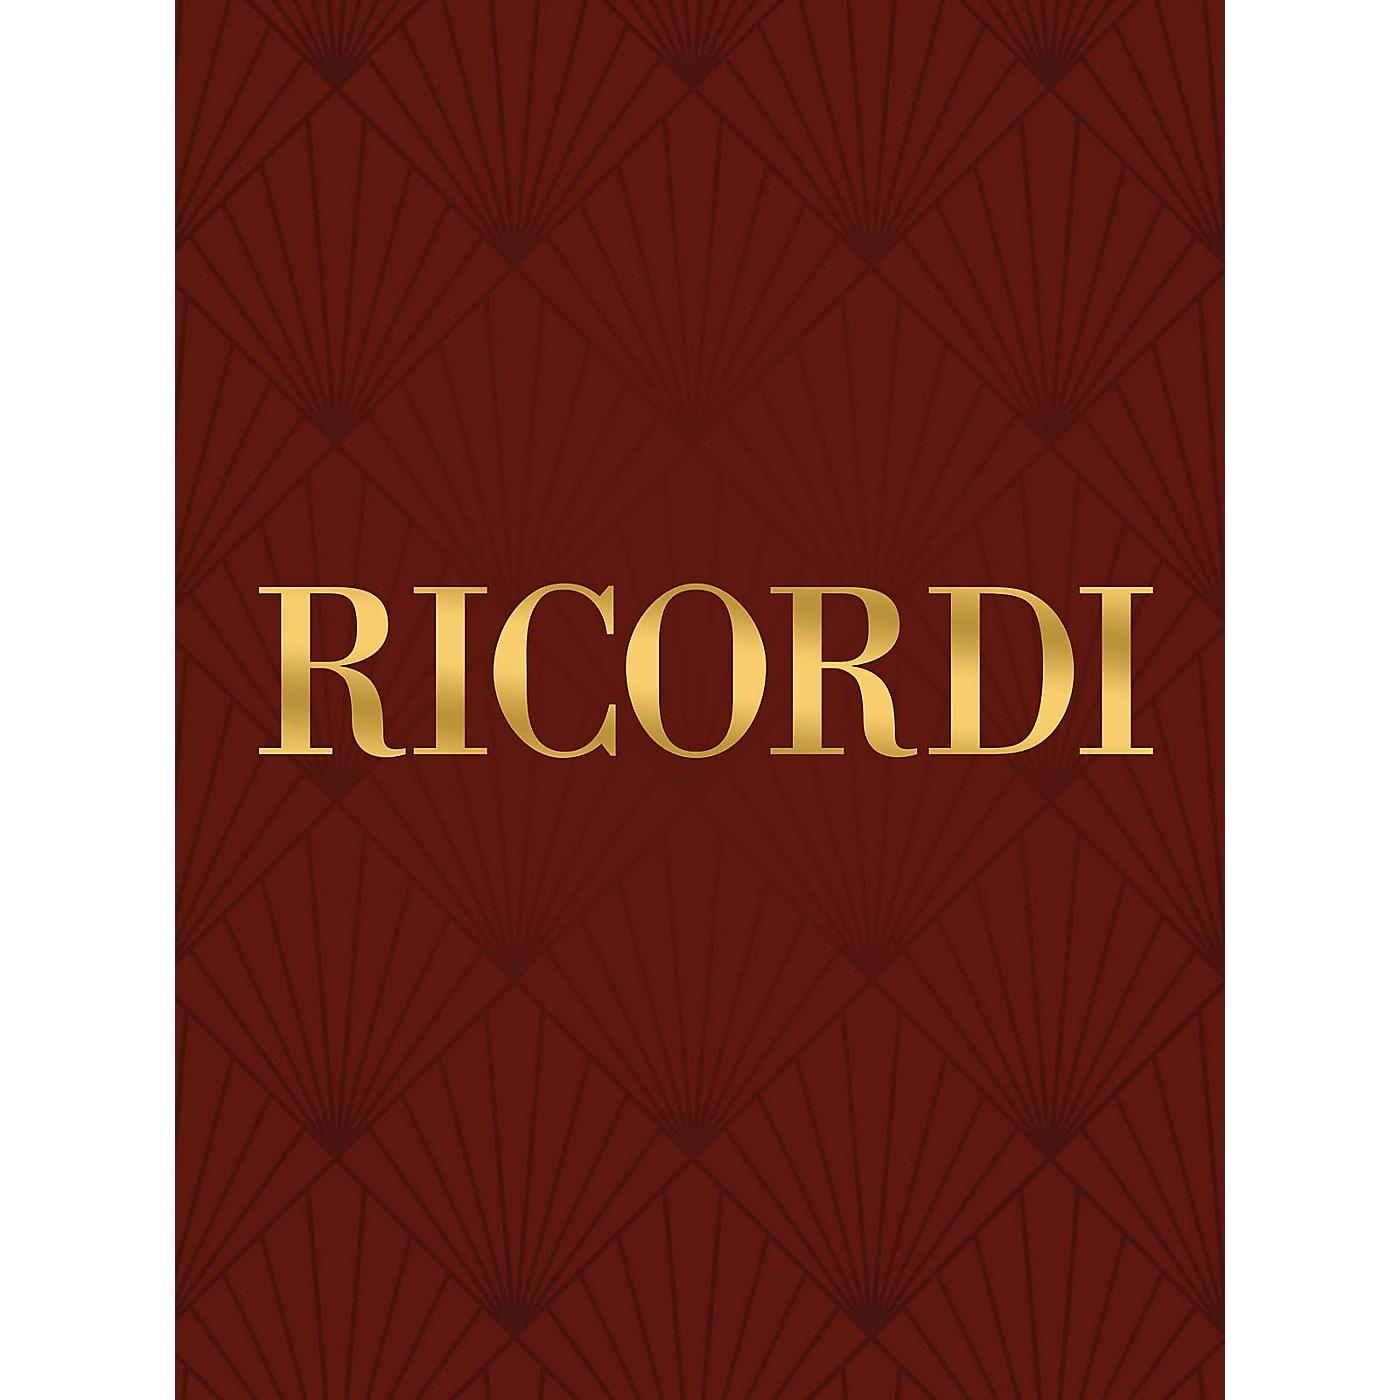 Hal Leonard Elisir D'amore Score New Art Cover Study Score Series Composed by Gaetano Donizetti thumbnail